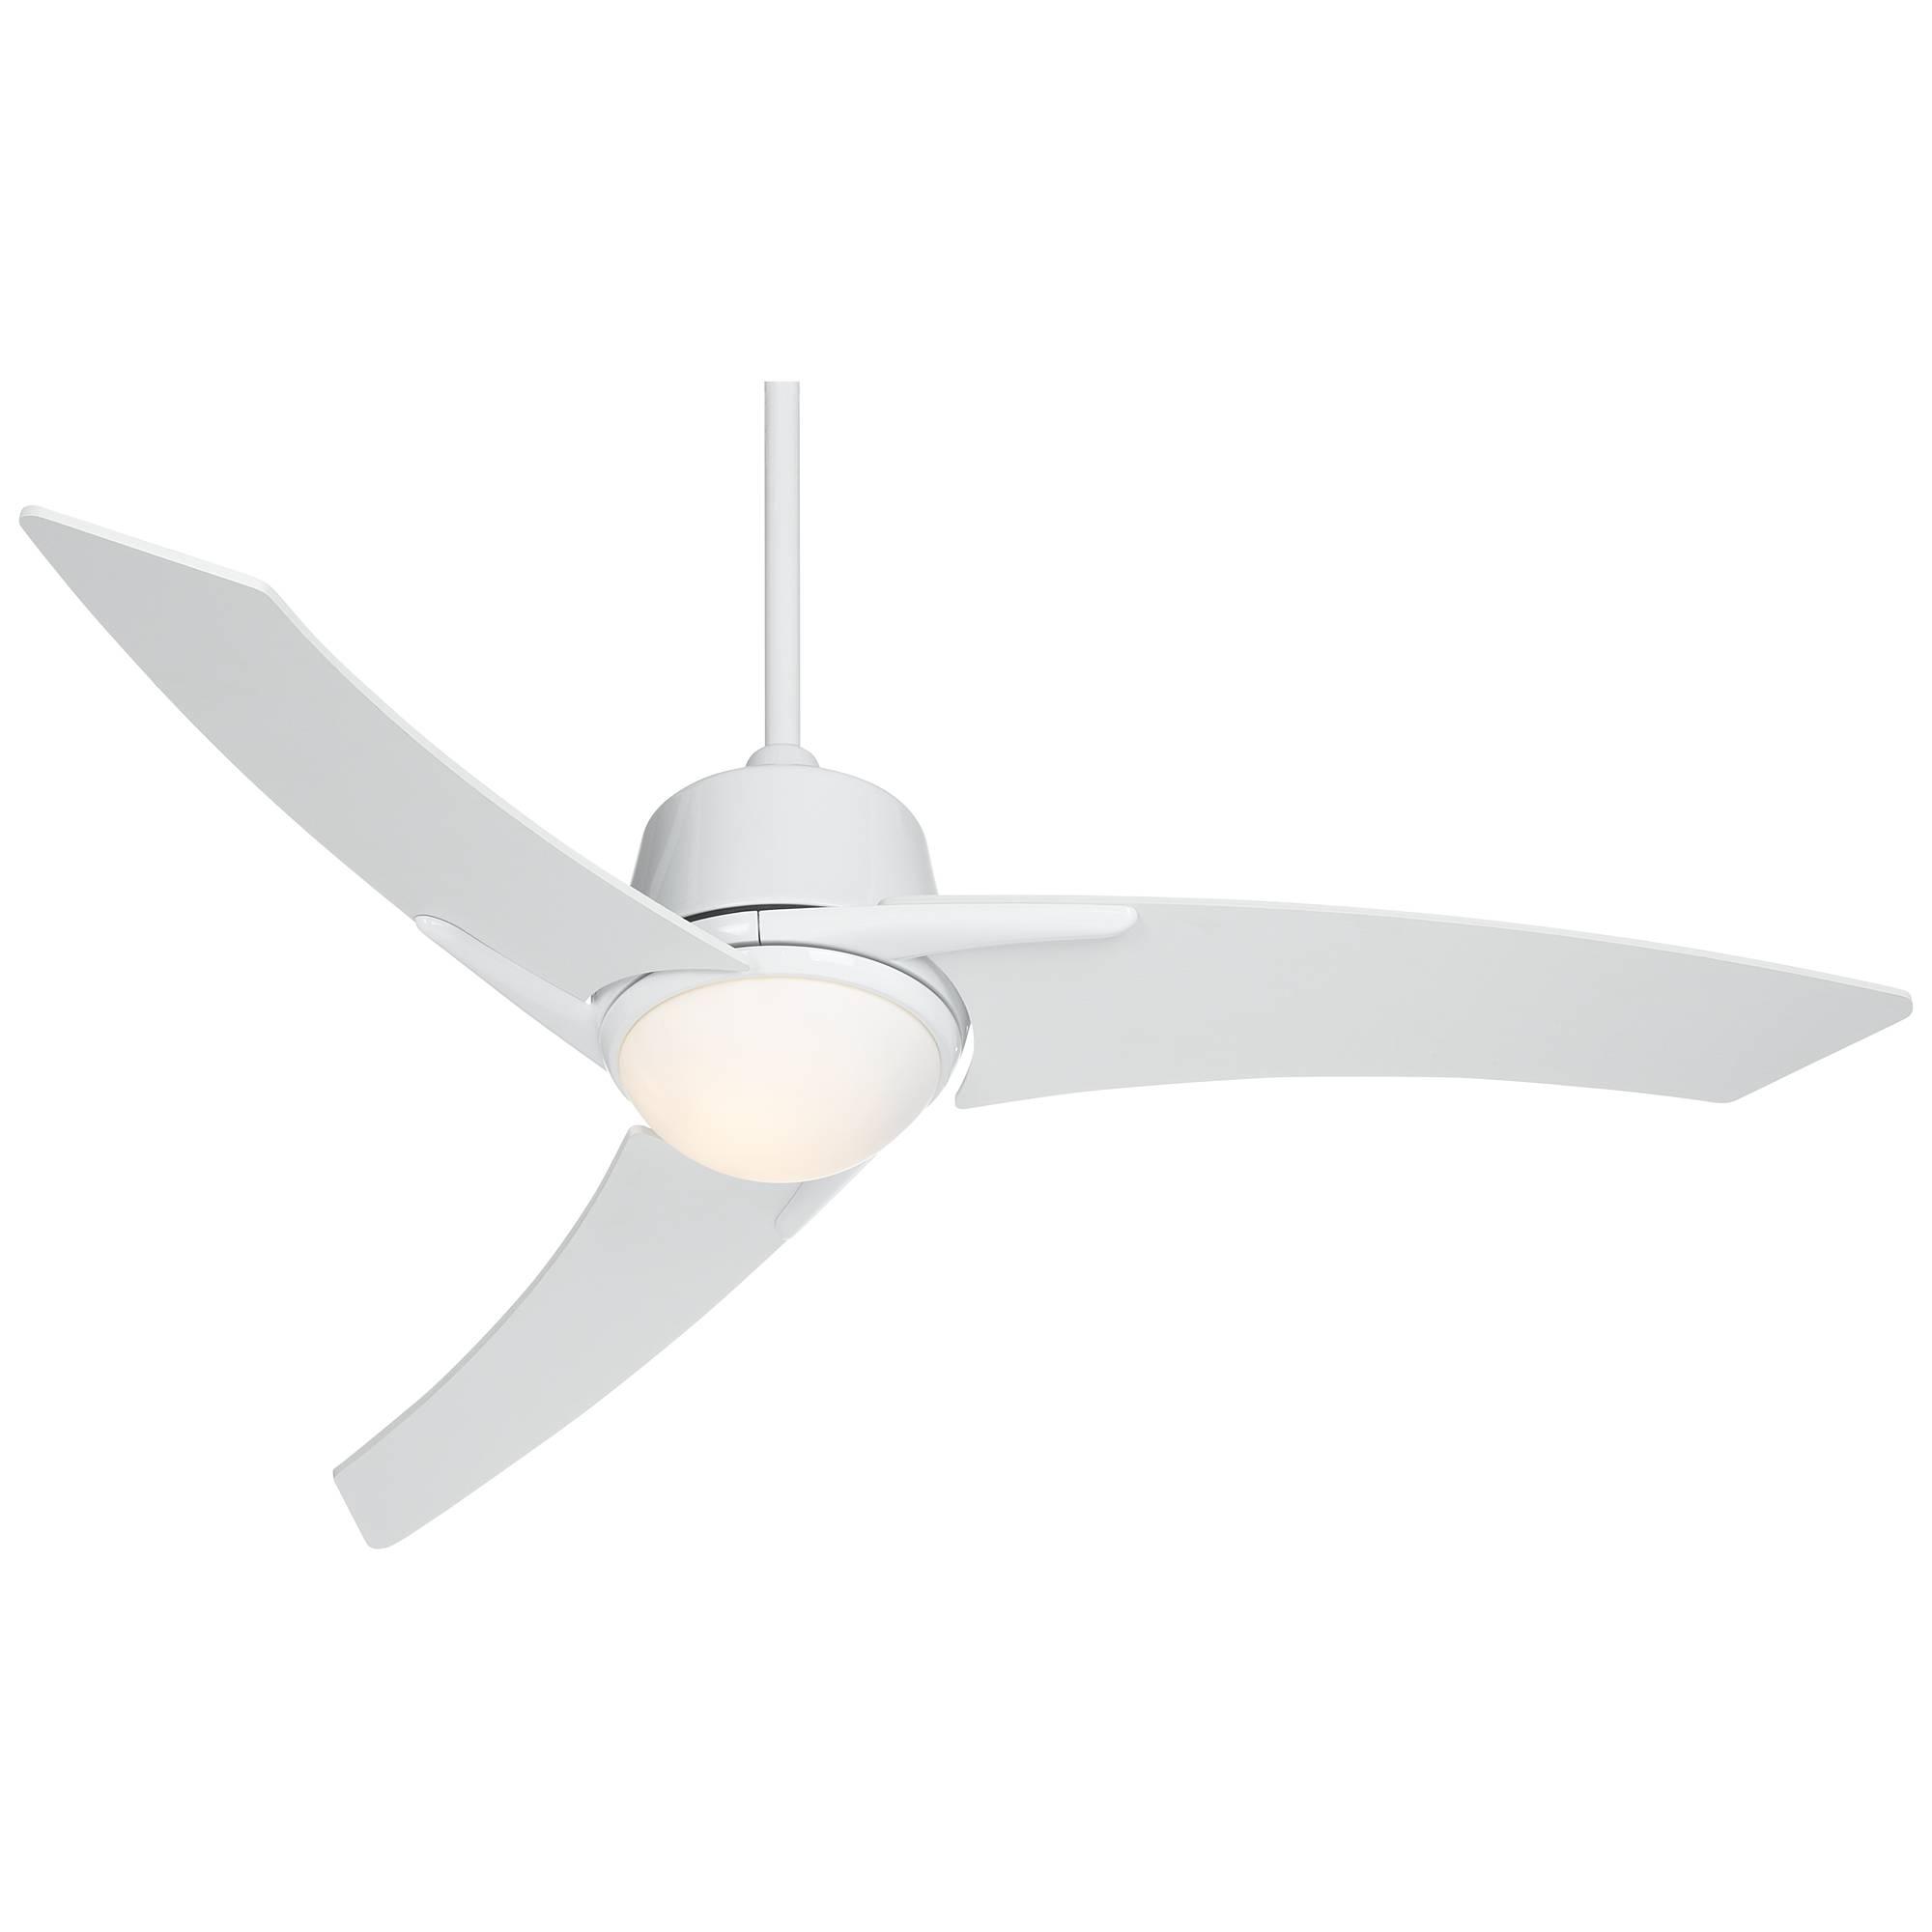 plus ceiling fans mount kichler lamps lights of fpx beautiful flush bedroom